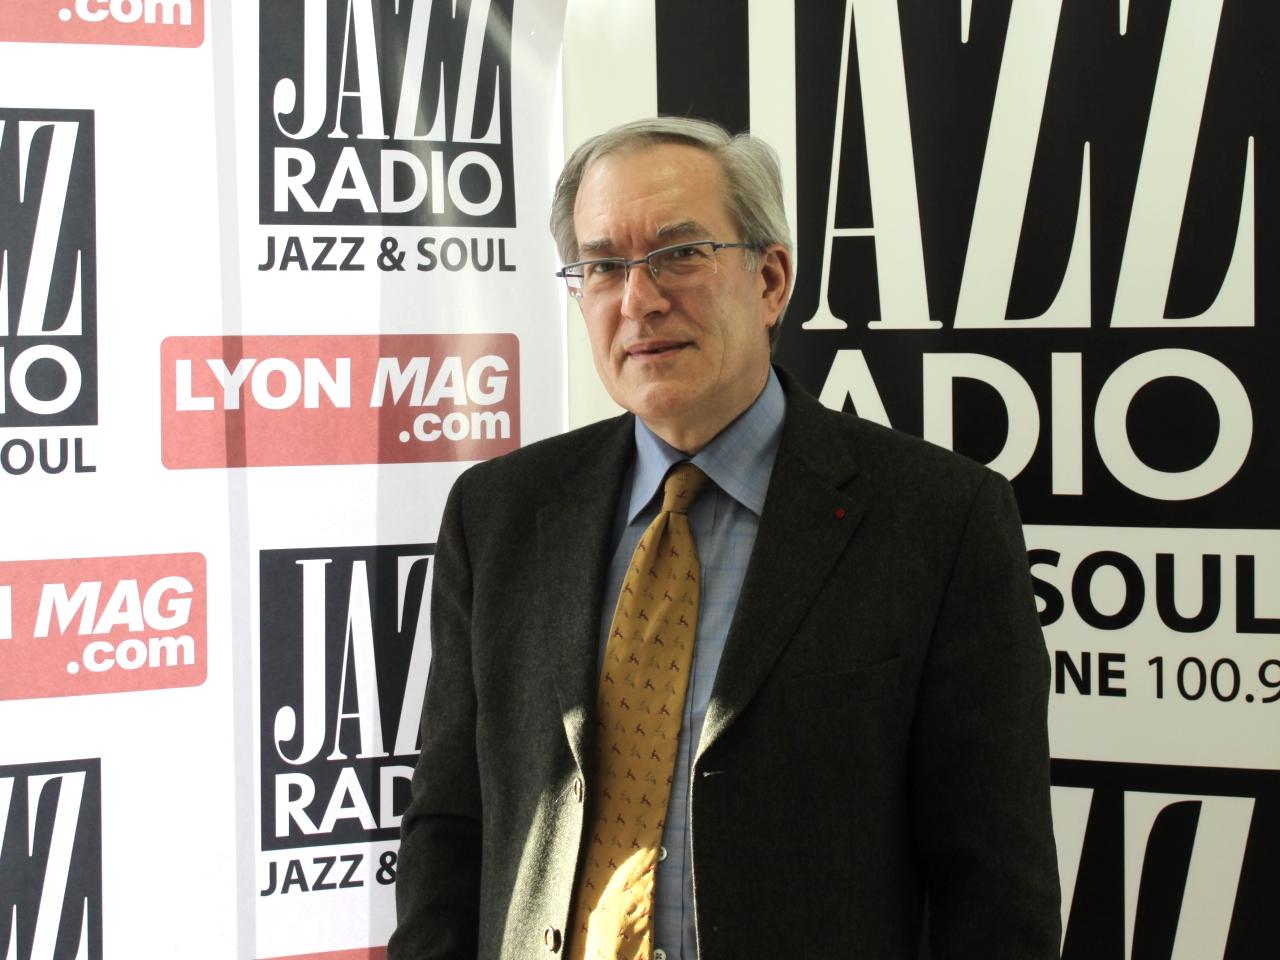 Dominique Deroubaix - LyonMag.com